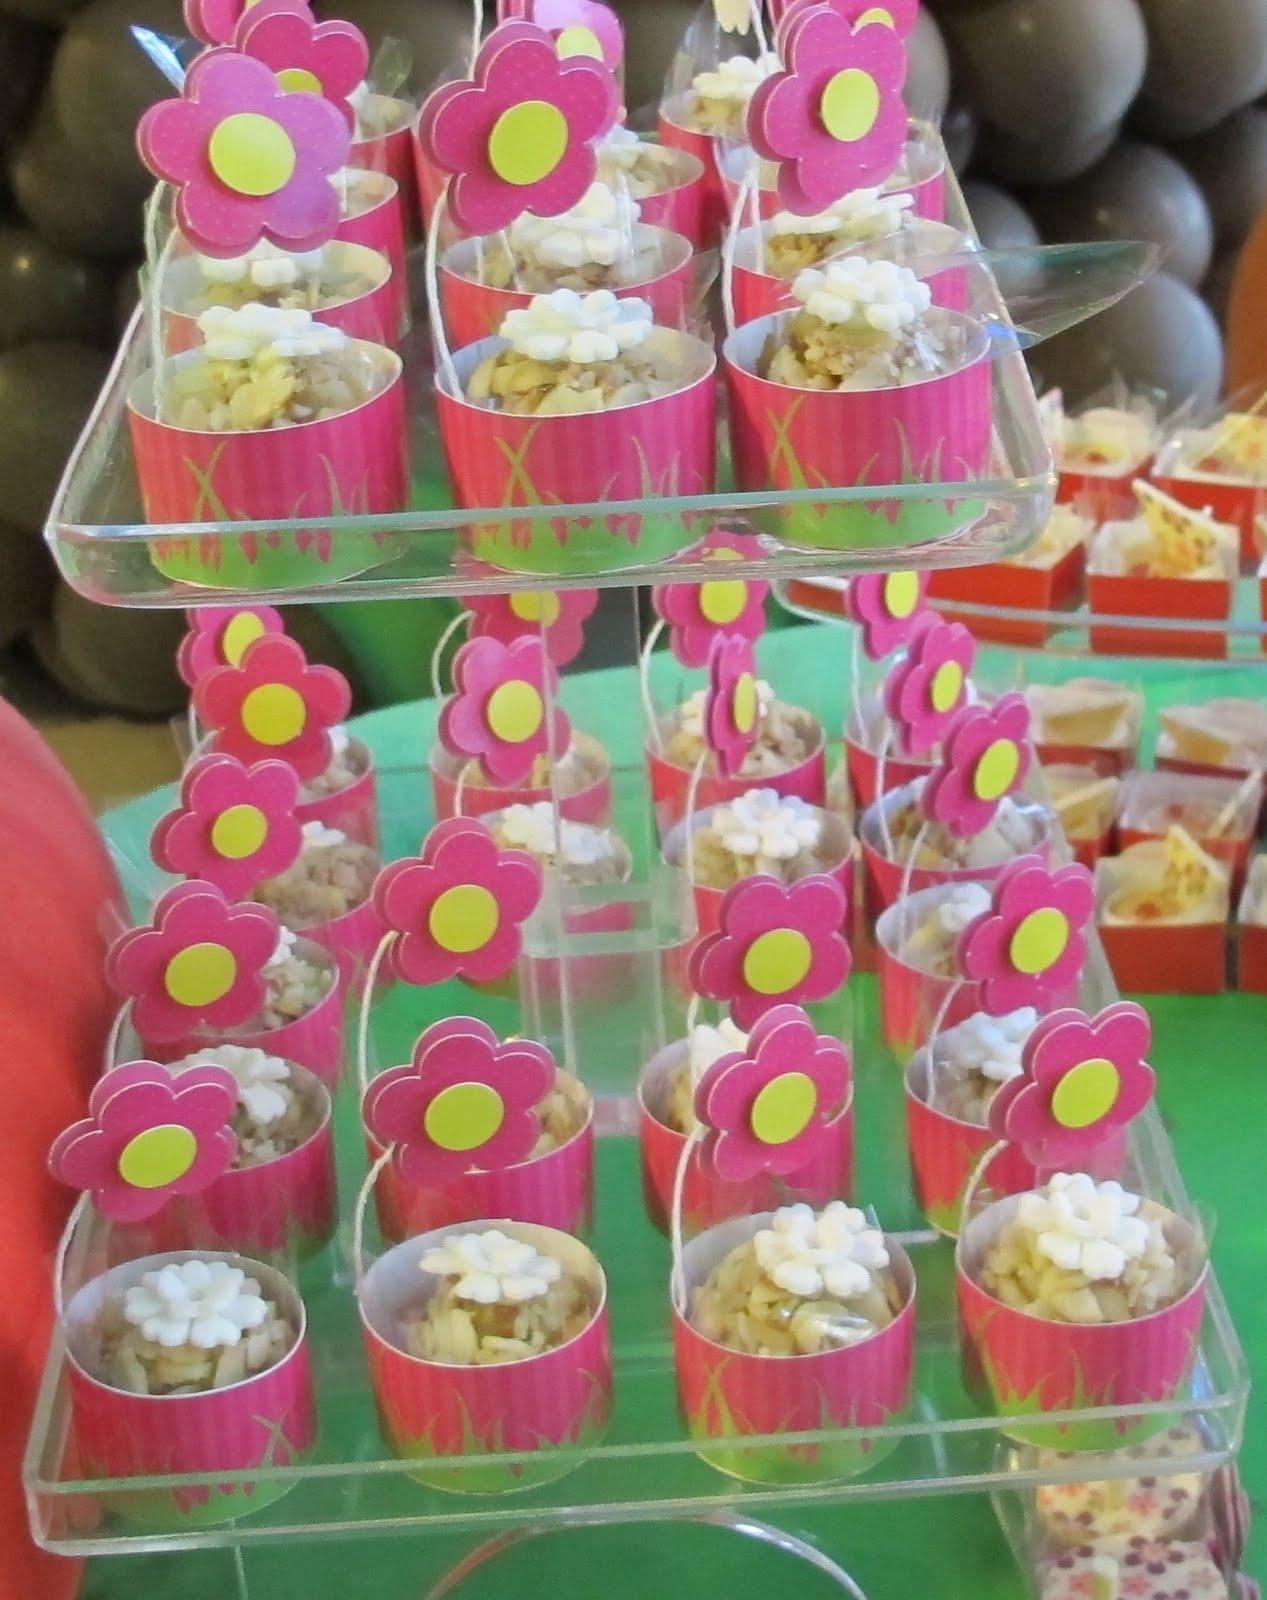 festa jardim infantil:Única Design: Festa Infantil – Jardim Colorido